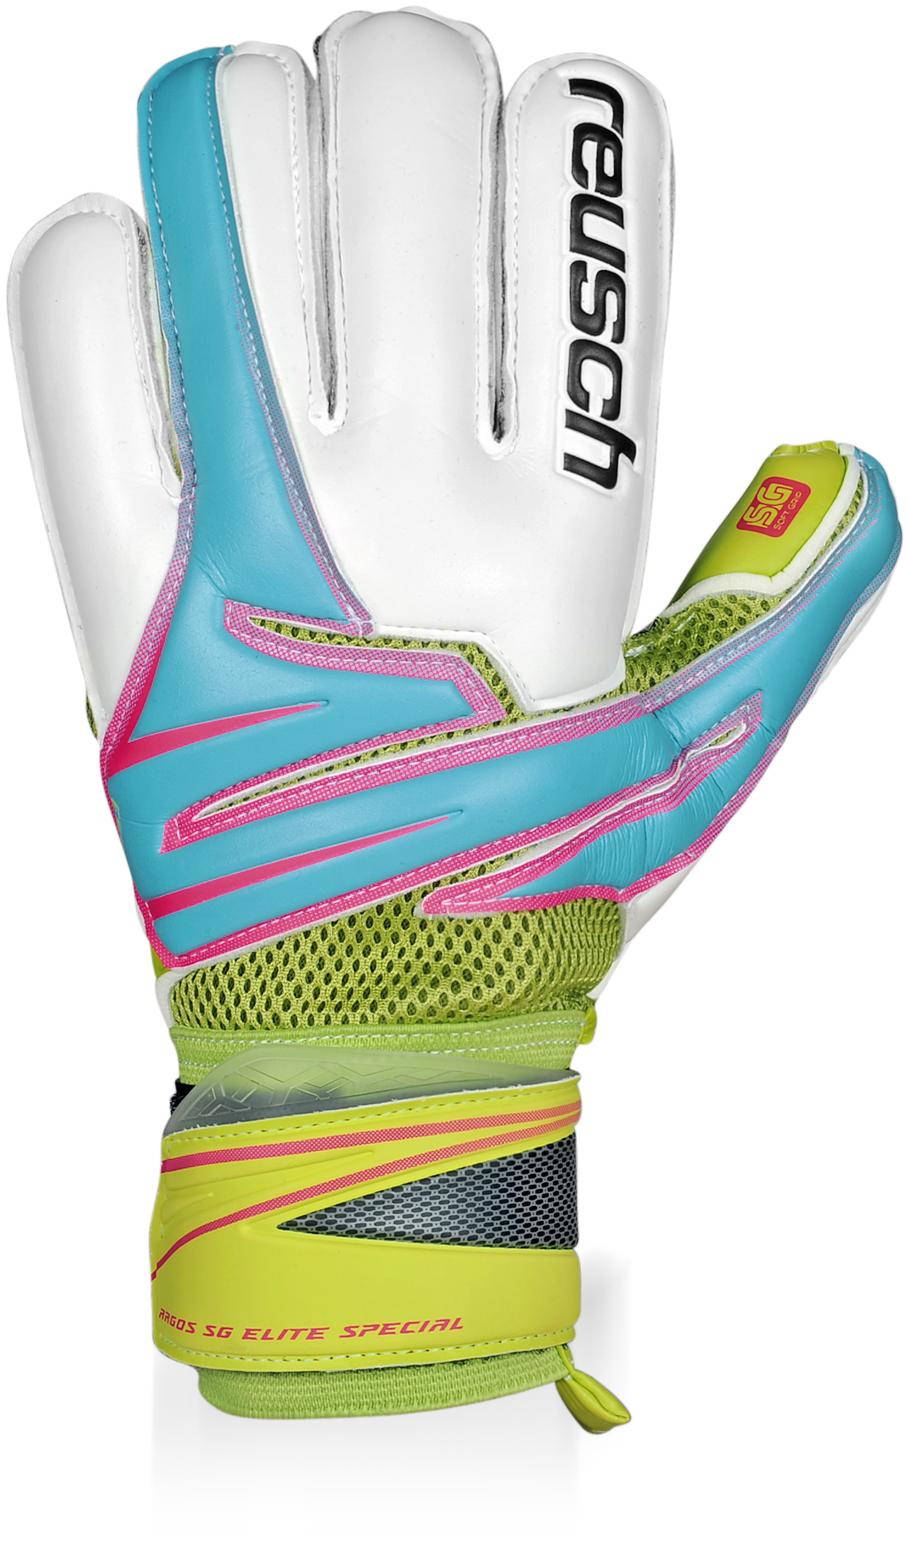 Reusch Argos Sg Elite Special Goalkeeper Gloves (aqua)